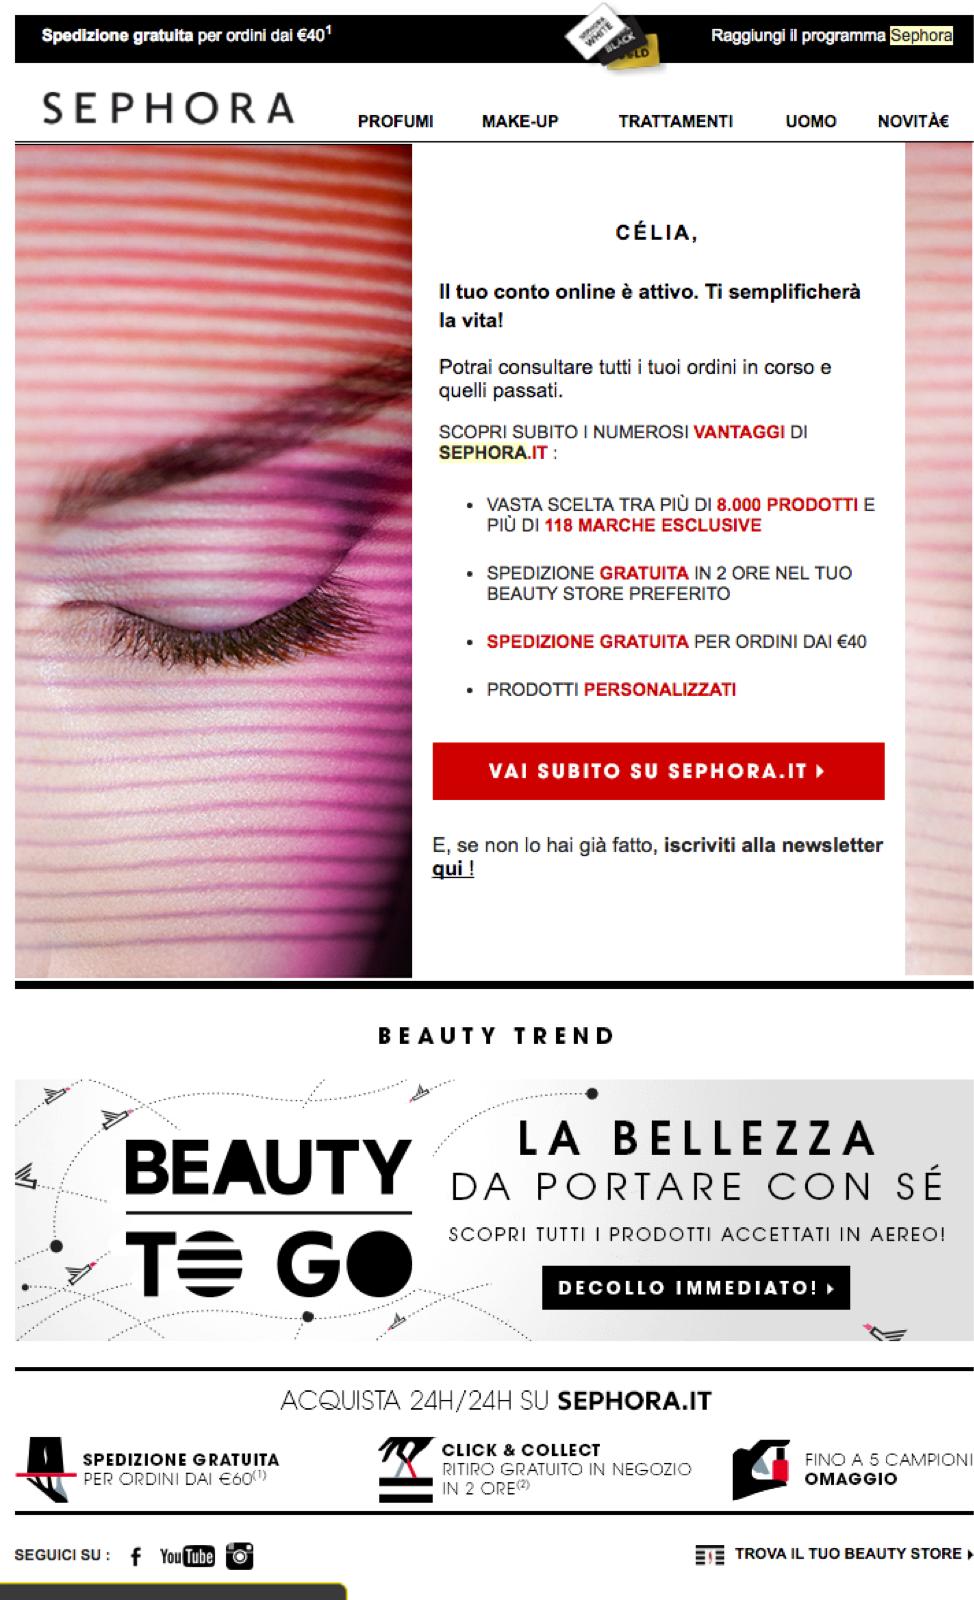 Sephora Italian welcome email